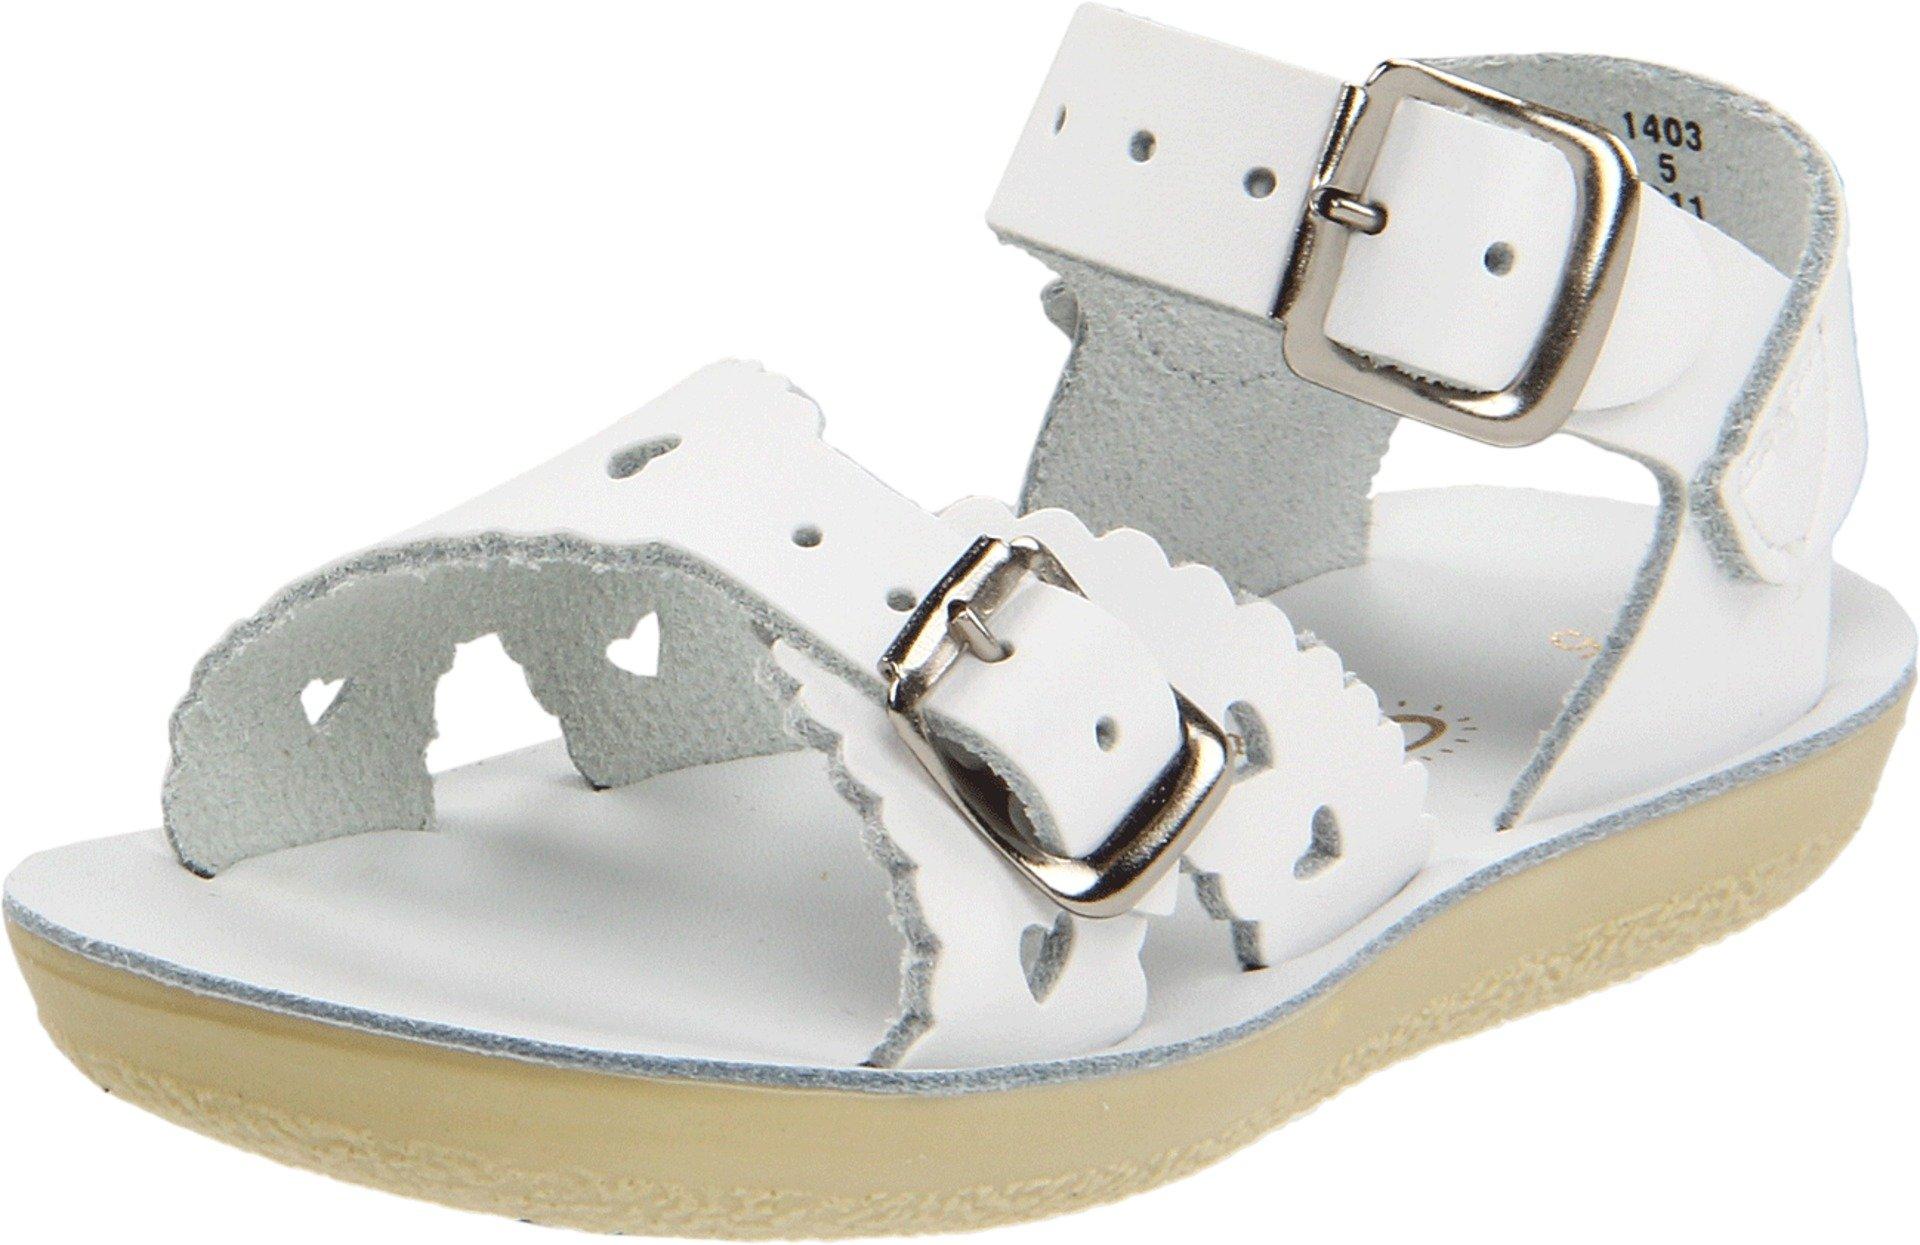 Salt Water Sandals by Hoy Shoe Sun-San-Sweetheart Sandal,White,6 M US Toddler